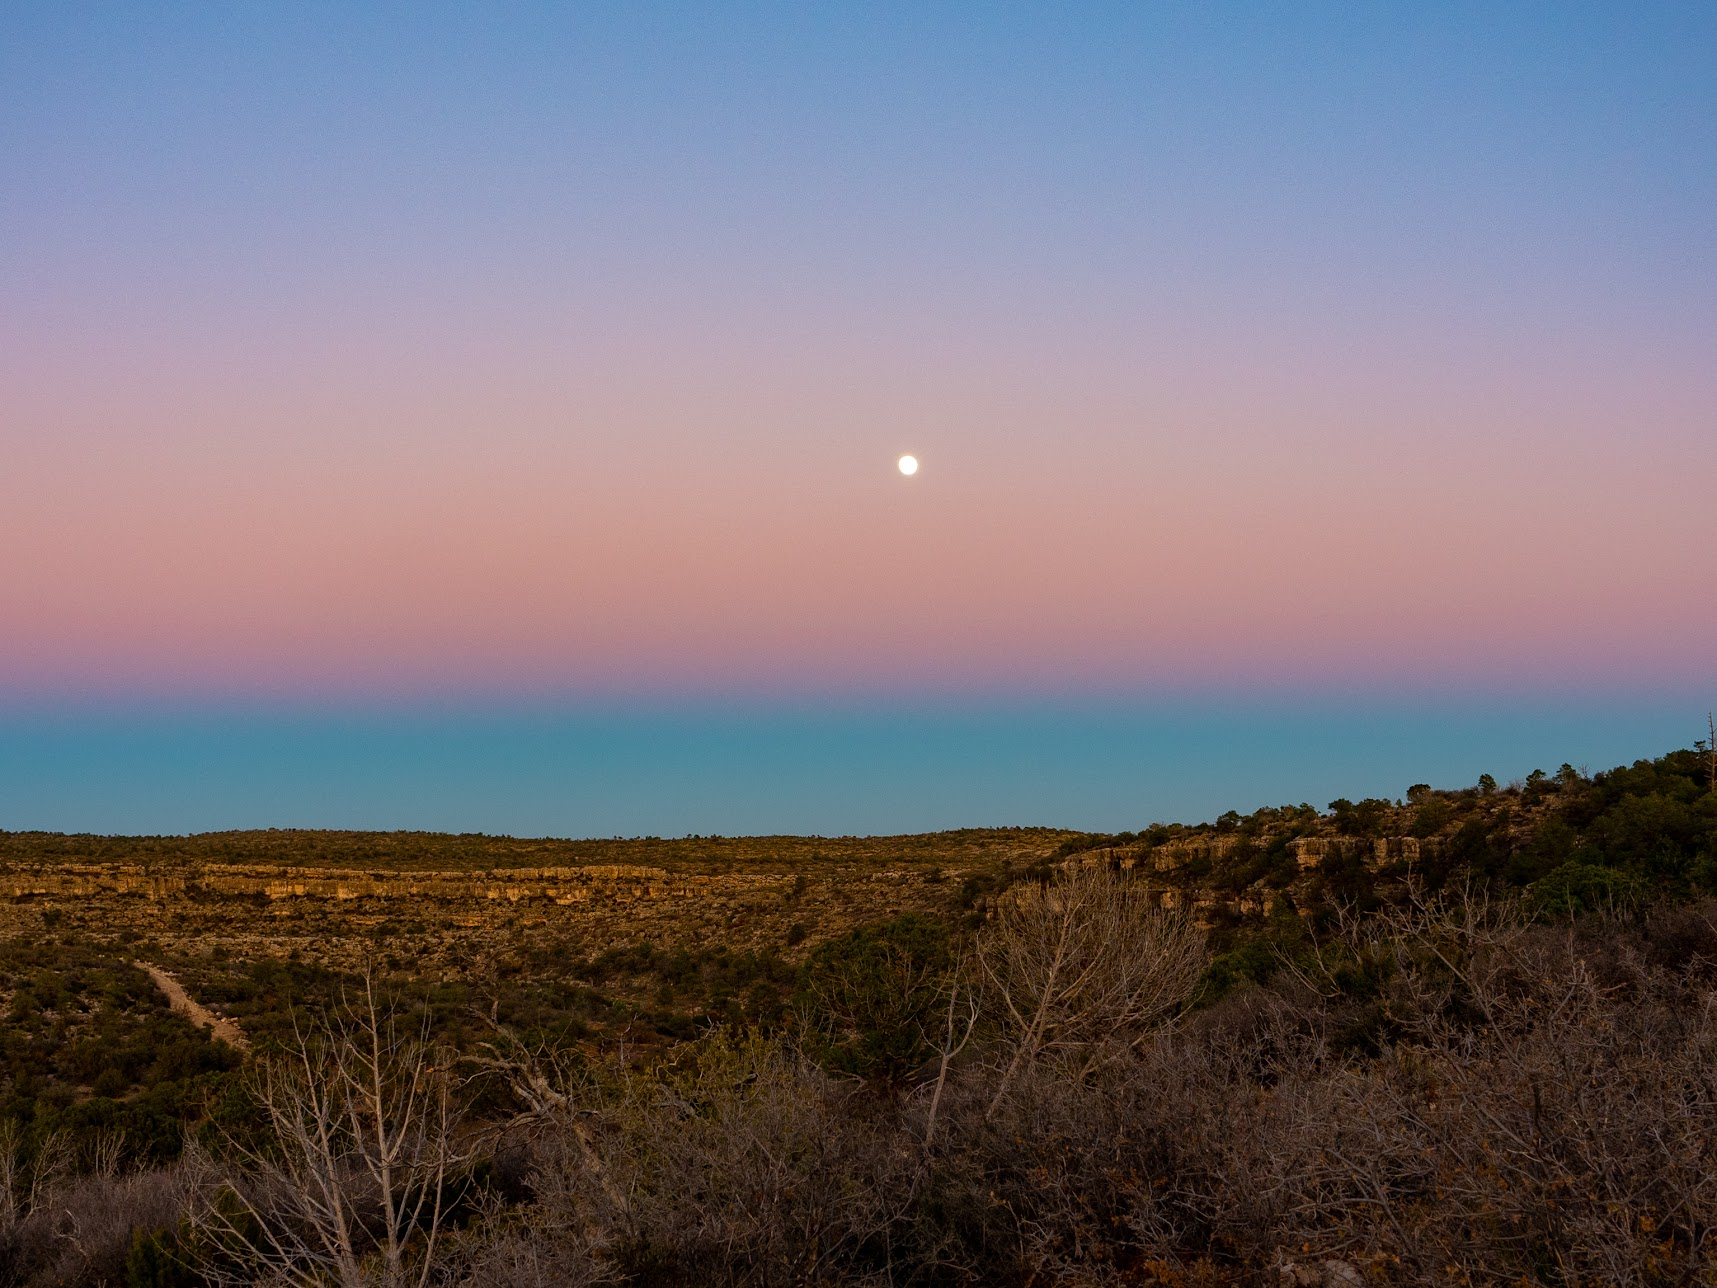 Moonrise, again